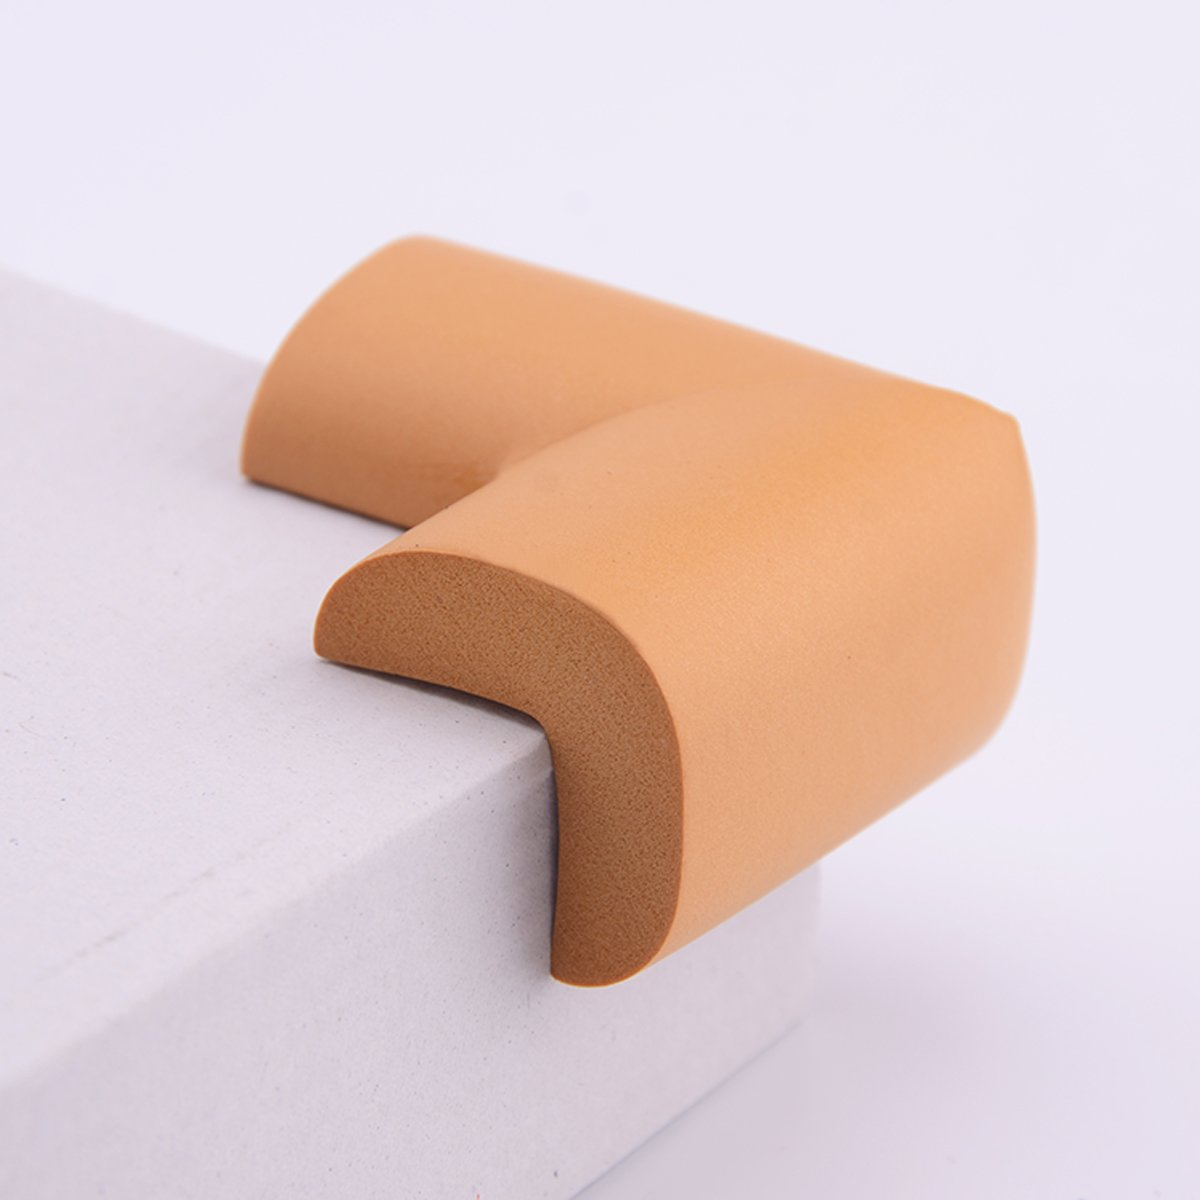 Cinta Adhesiva Pack Rosa:Cinta 5m+12 esquinas+cinta adhesiva Protecci/ón Bordes y Esquinas Hiper Grueso Denso Extra Ancho Amortiguaci/ón Golpes PEKITAS- Pack Cinta 5 Metros +12 Esquinas